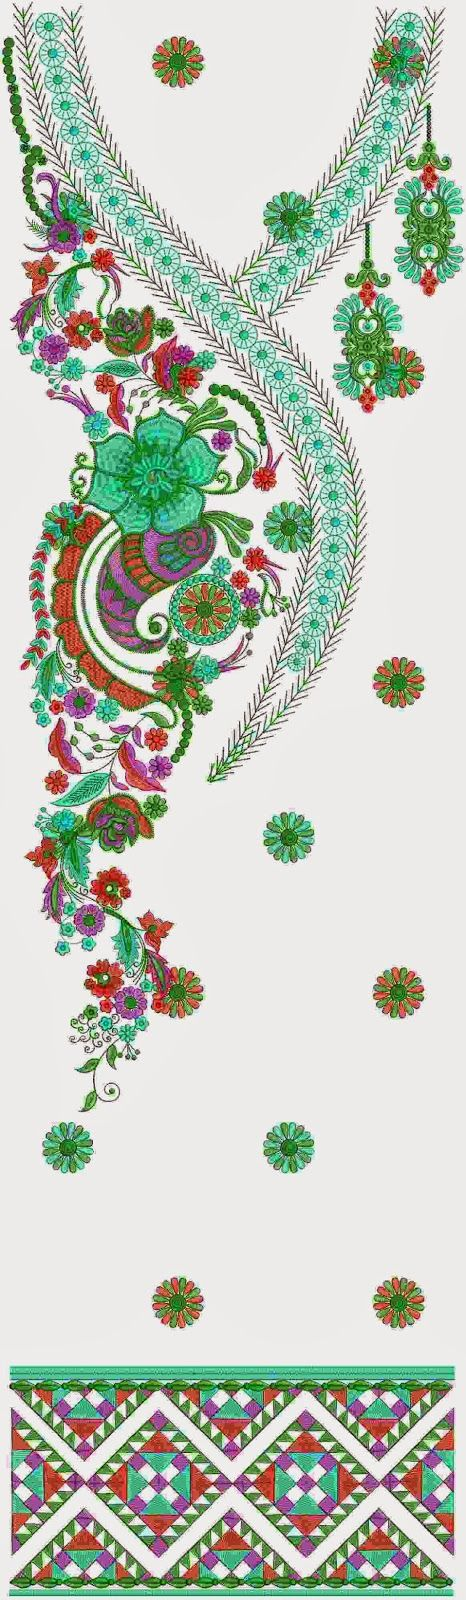 Lightning Kurti Neck Dress Embroidery Designs - Embdesigntube